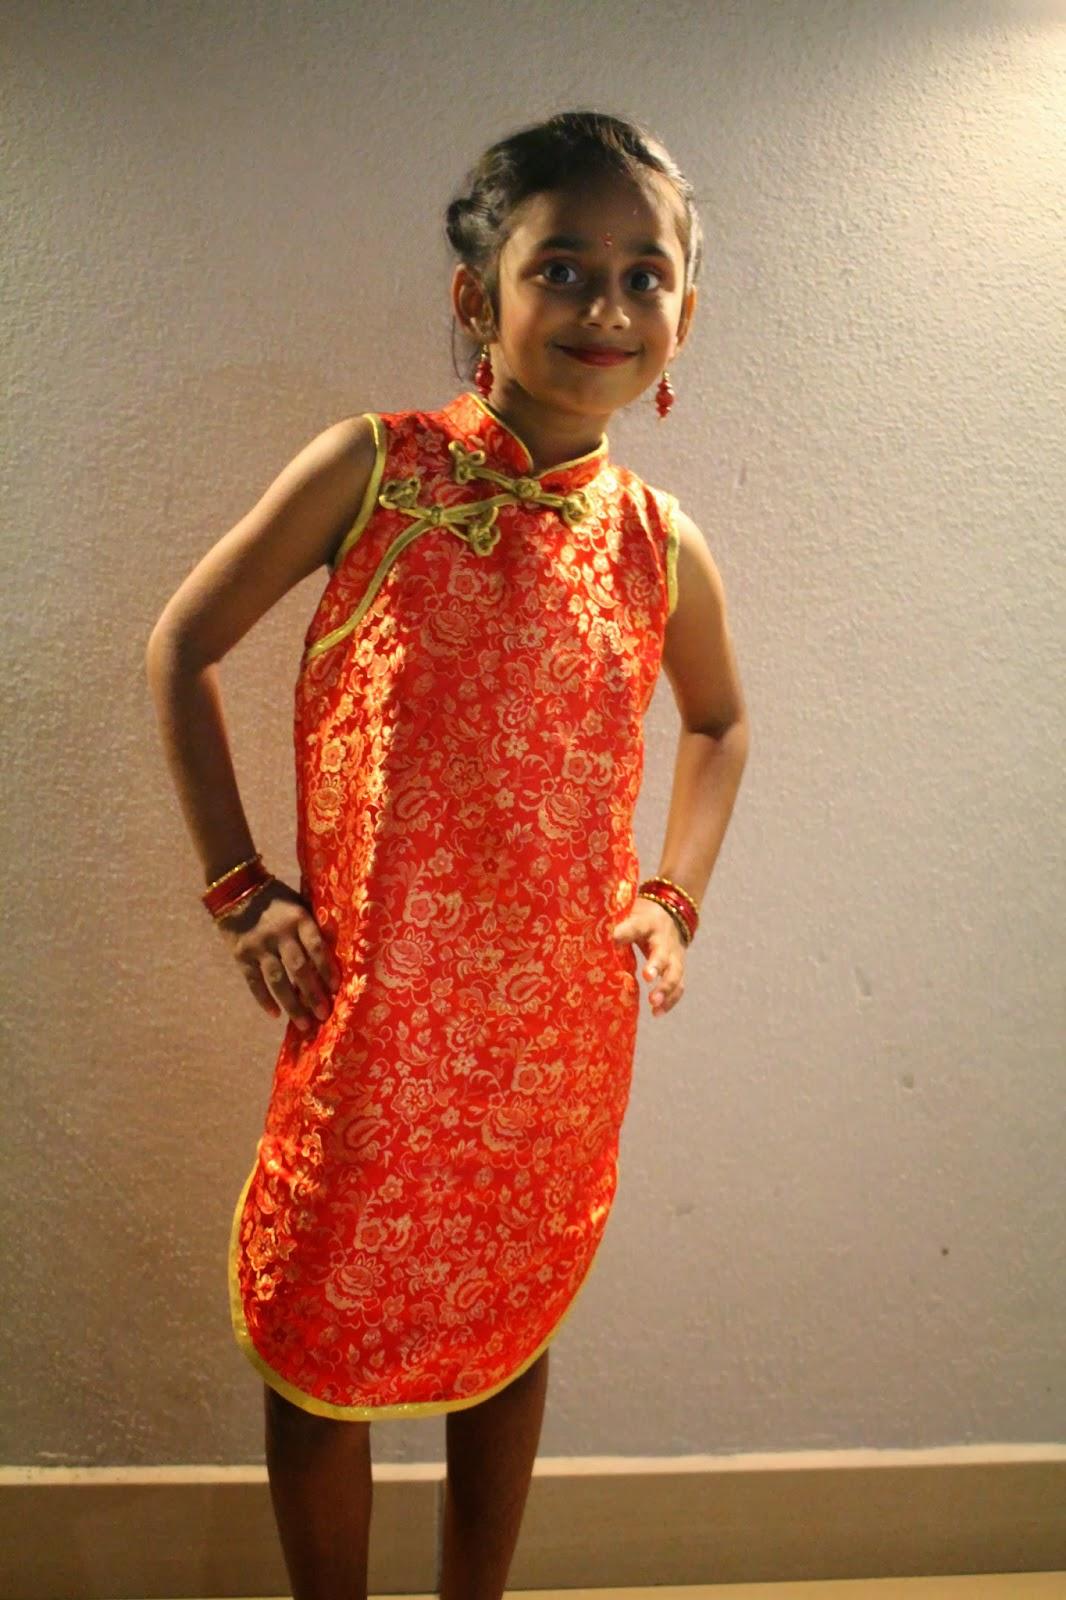 Chinese Red Wedding Dress 63 New Cheongsam for Chinese New